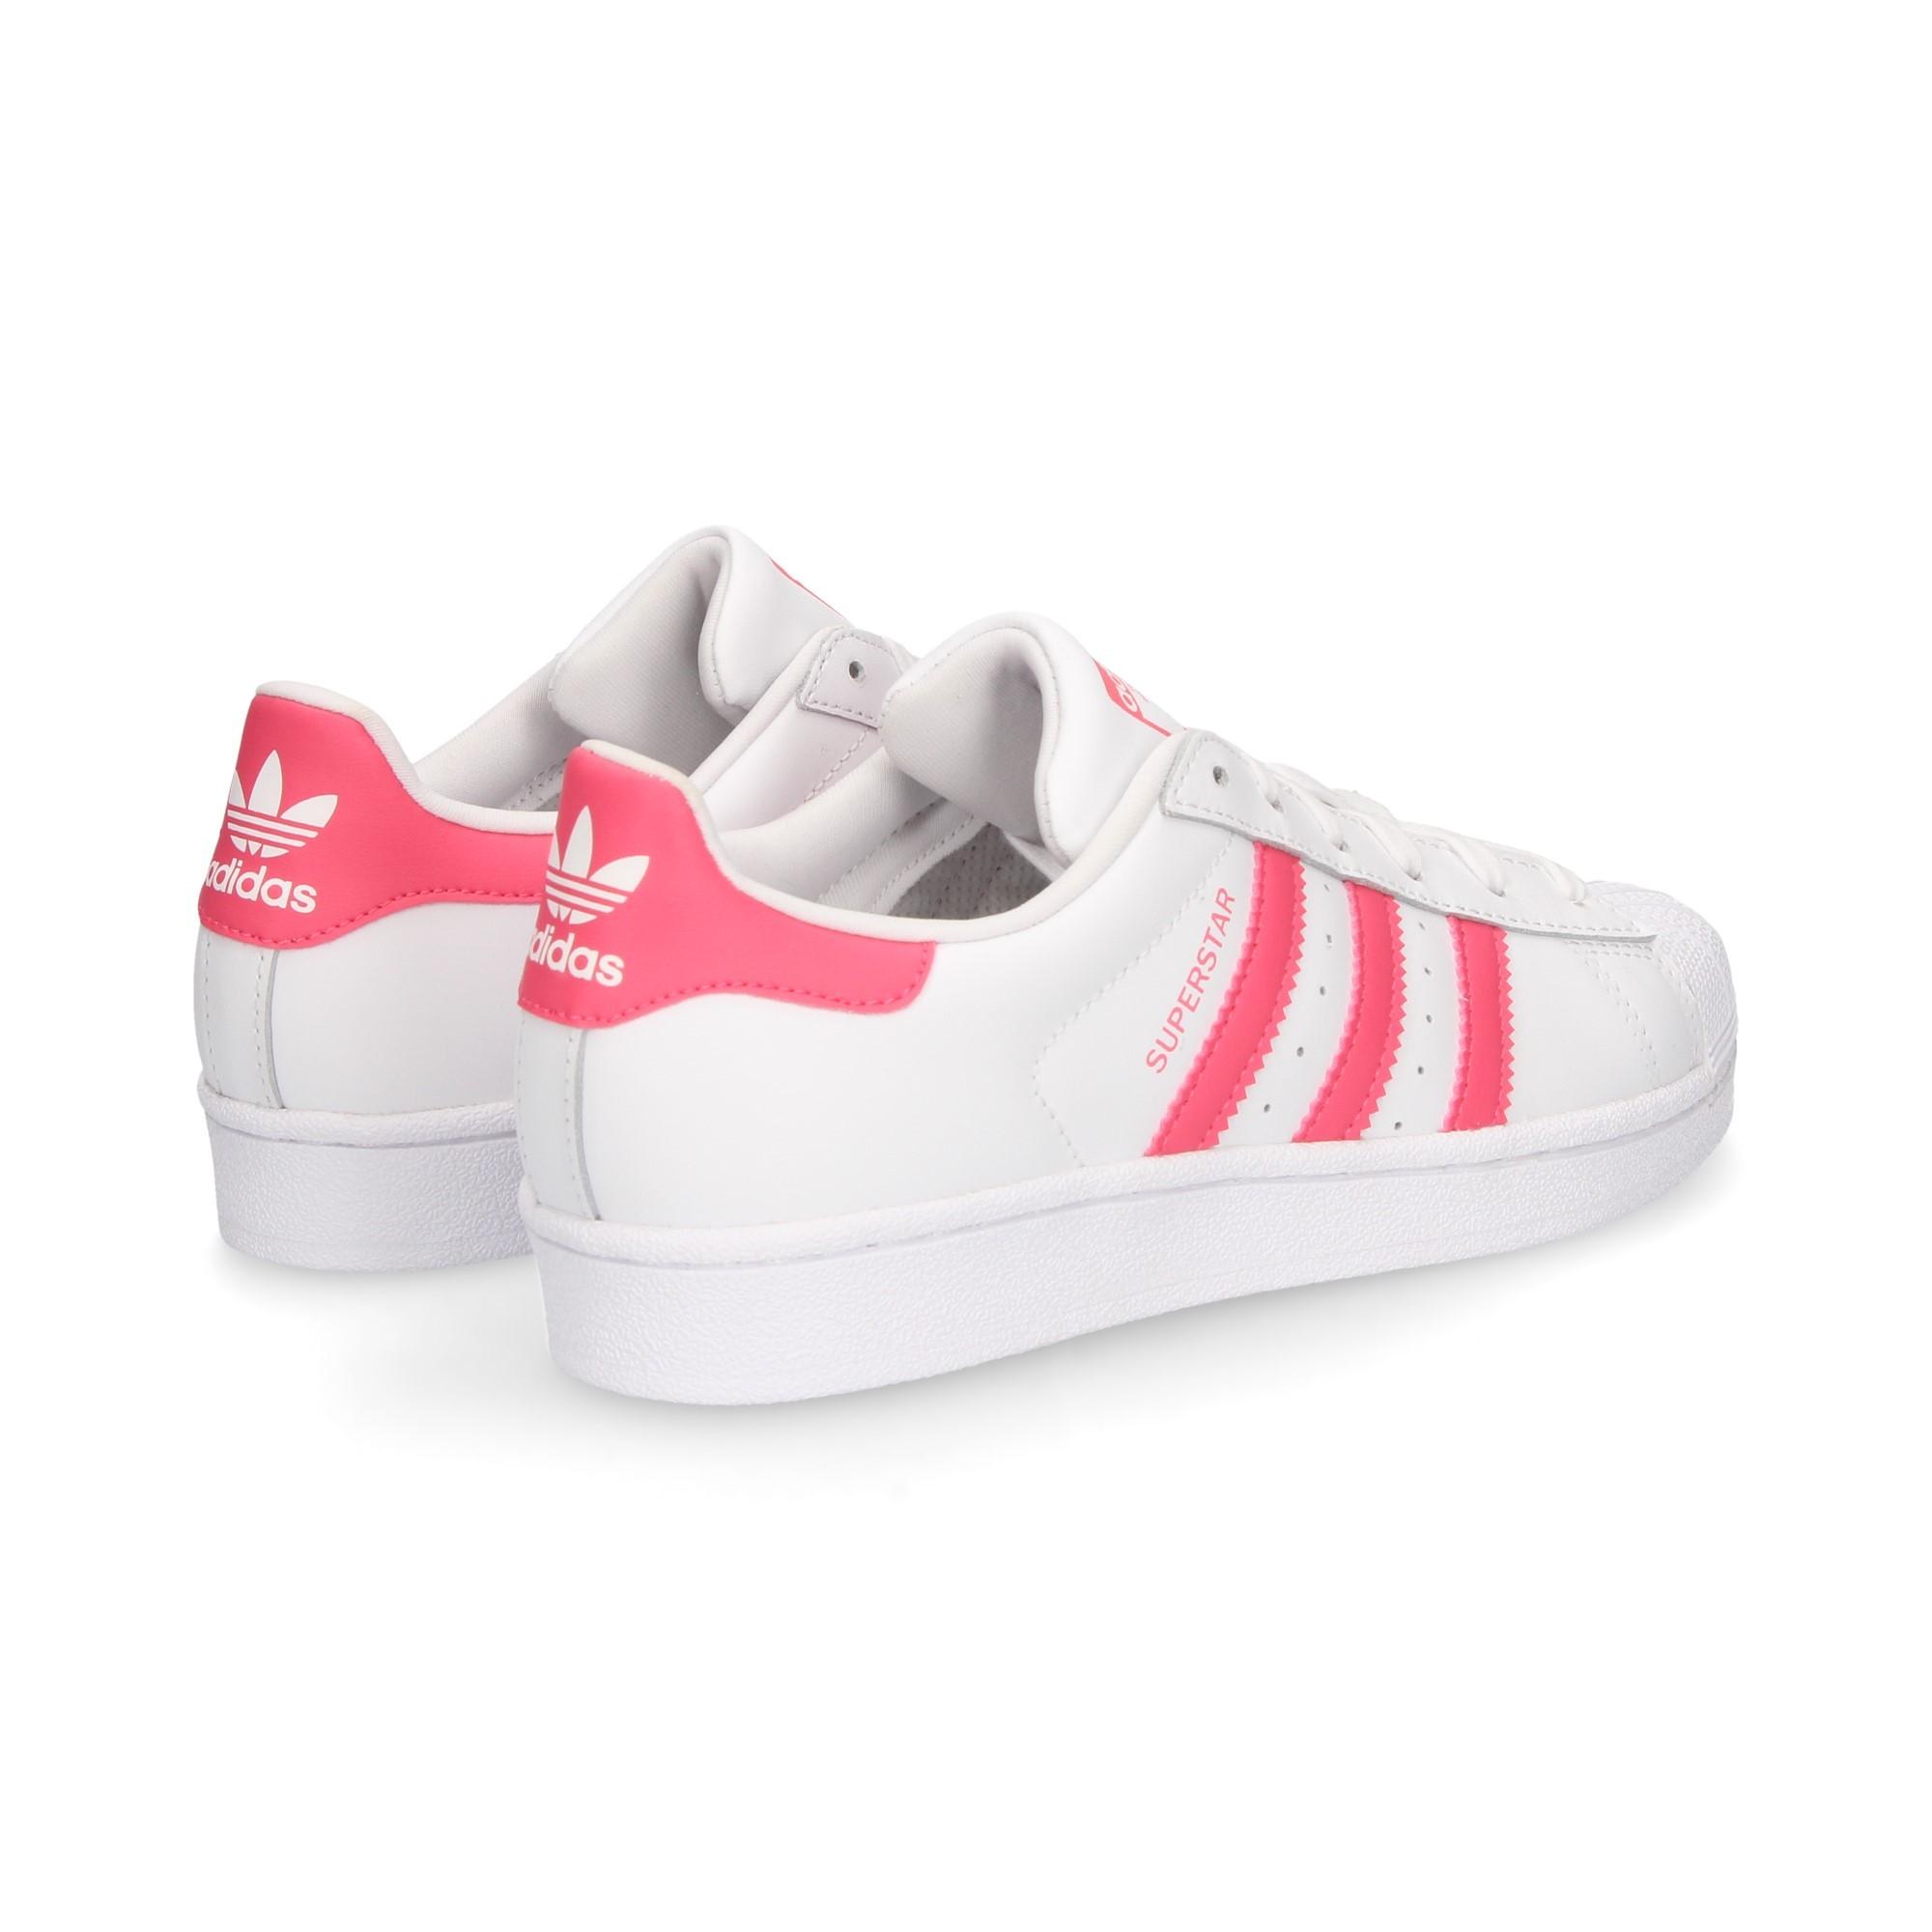 3-bandas-cordon-blanco-rosa